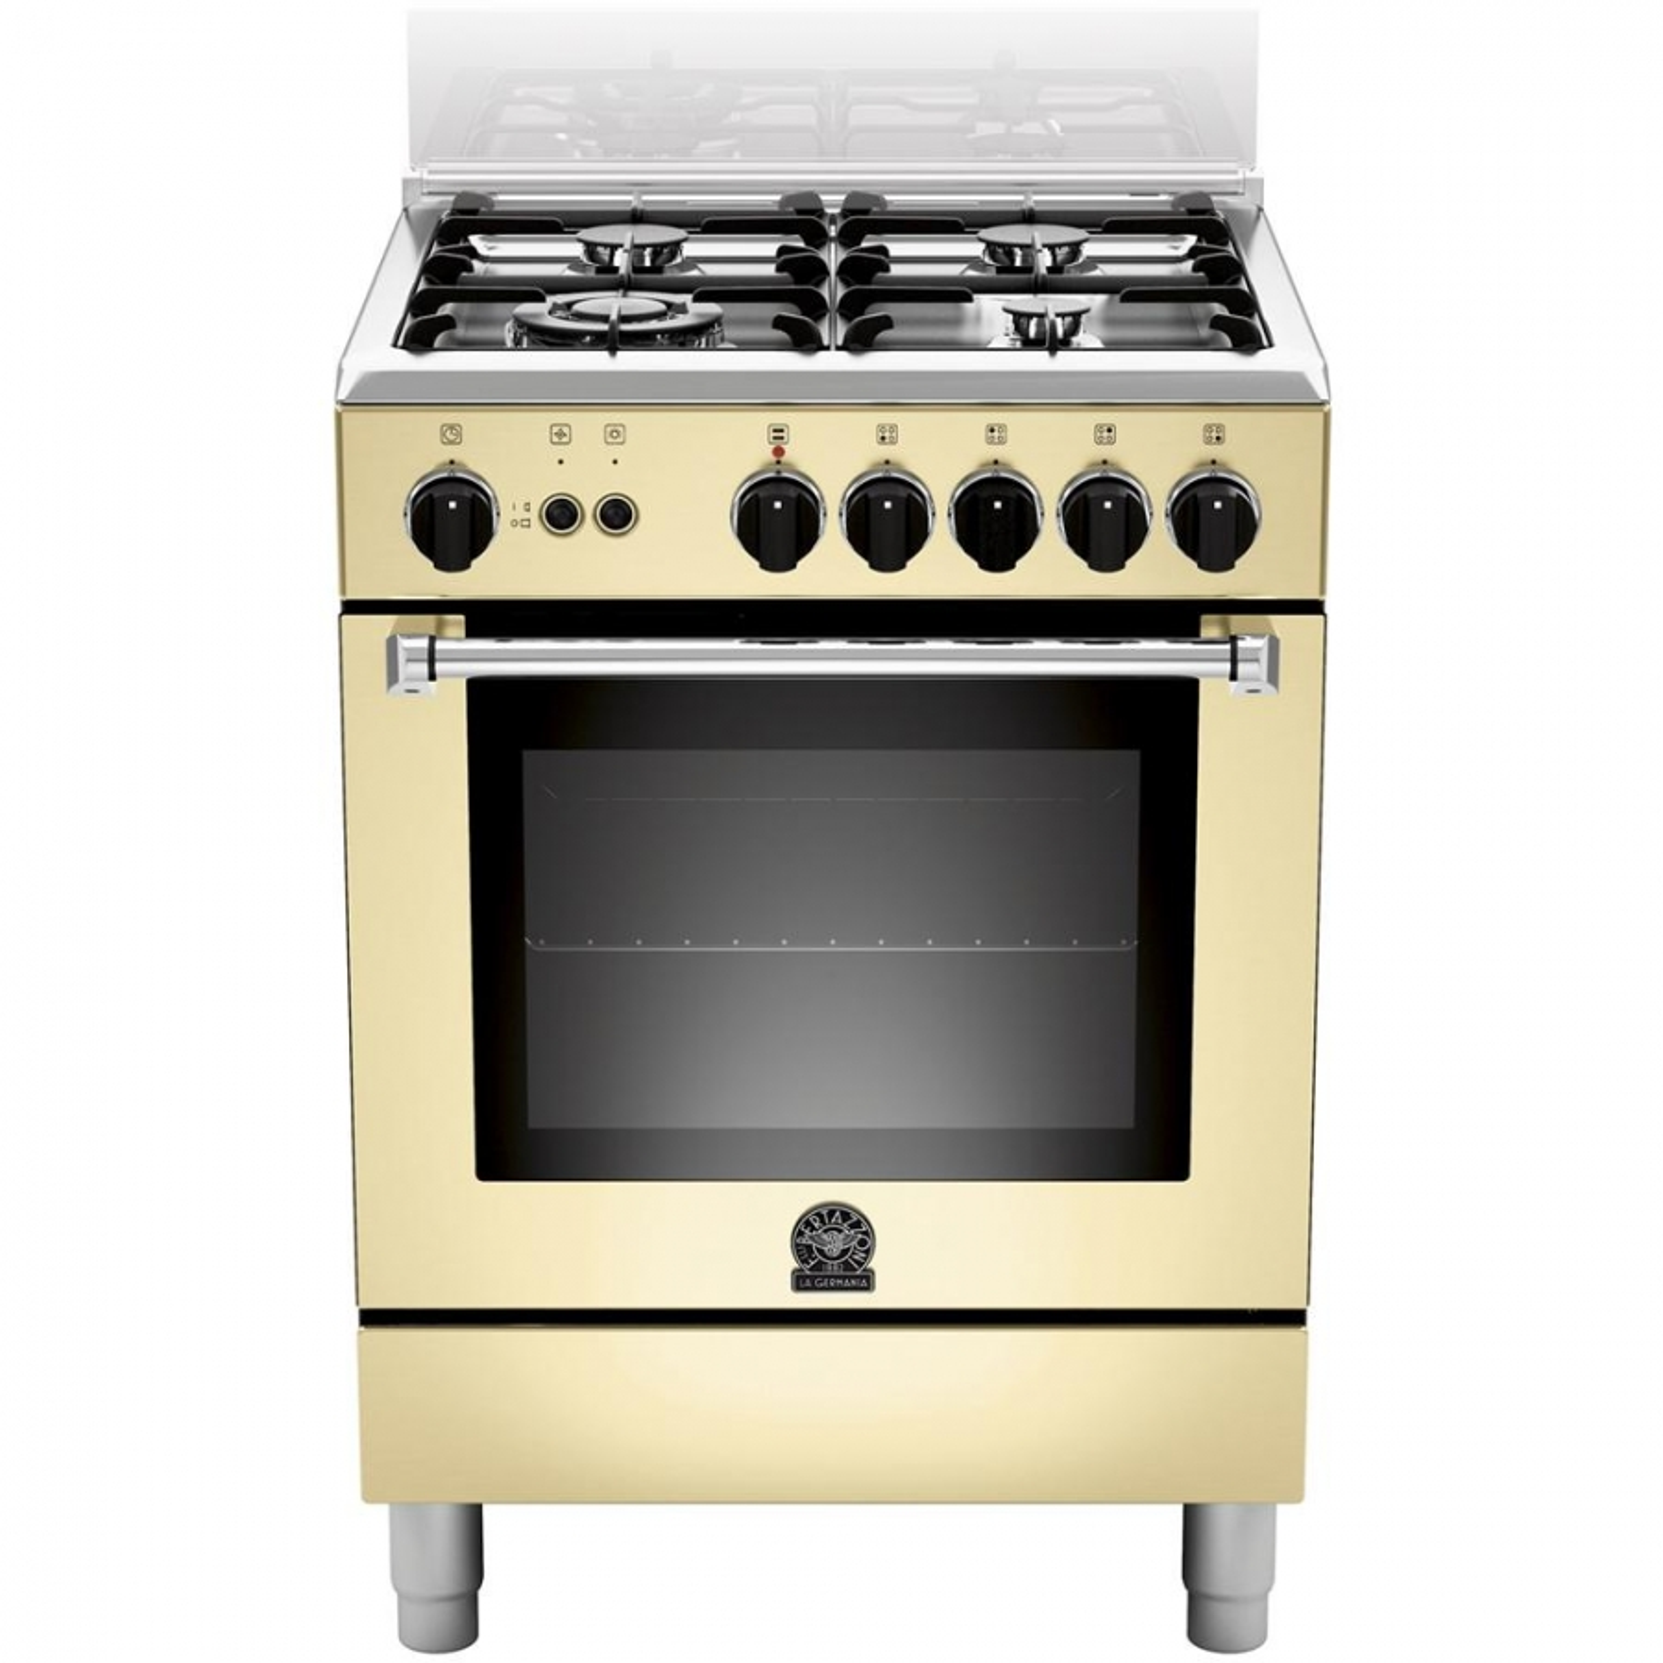 Cucina la germania prezzi 28 images cucine - Spiata in bagno ...